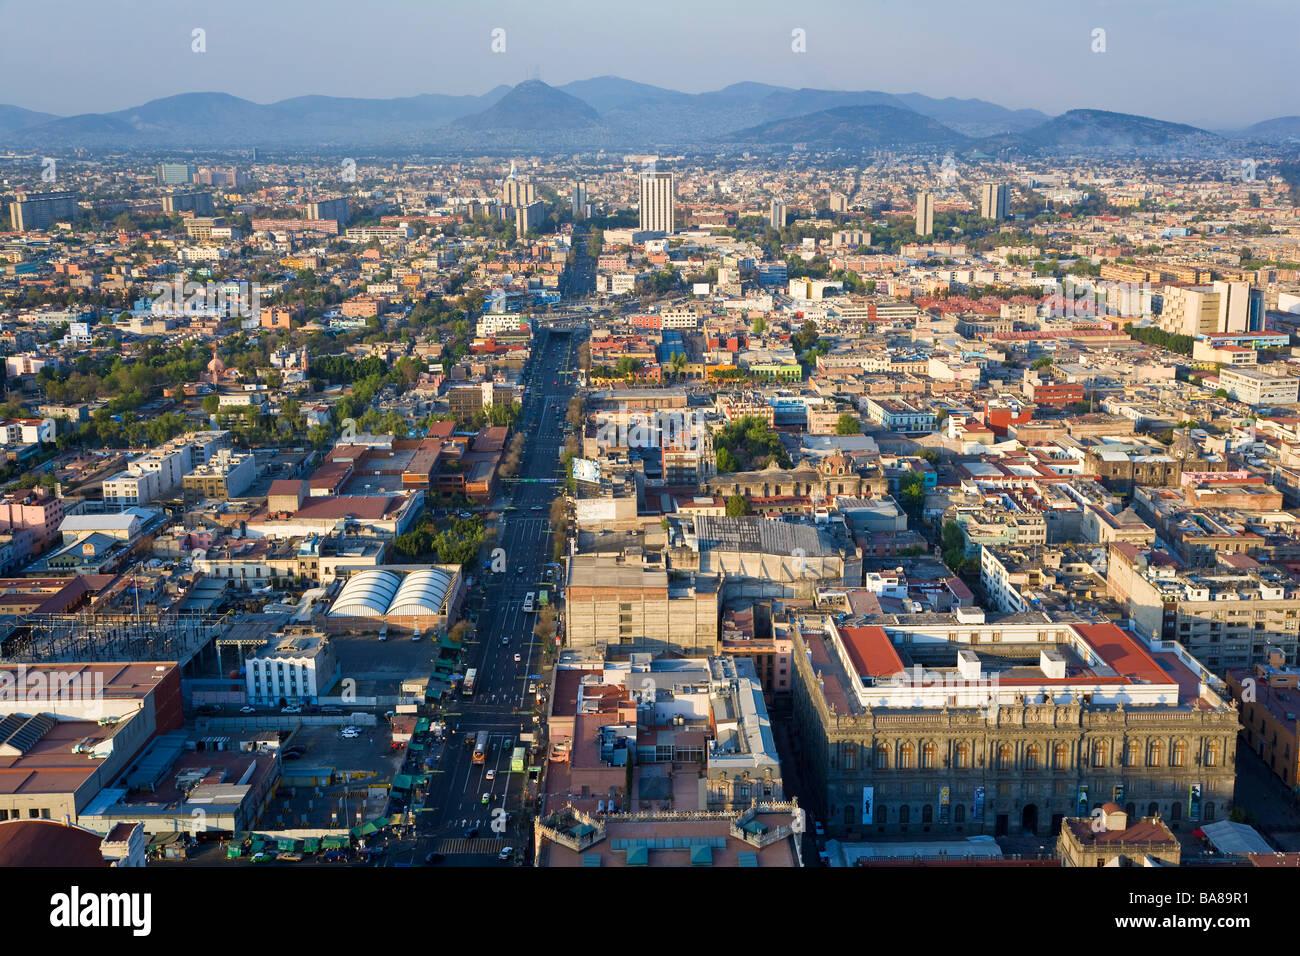 View over Mexico City Mexico - Stock Image